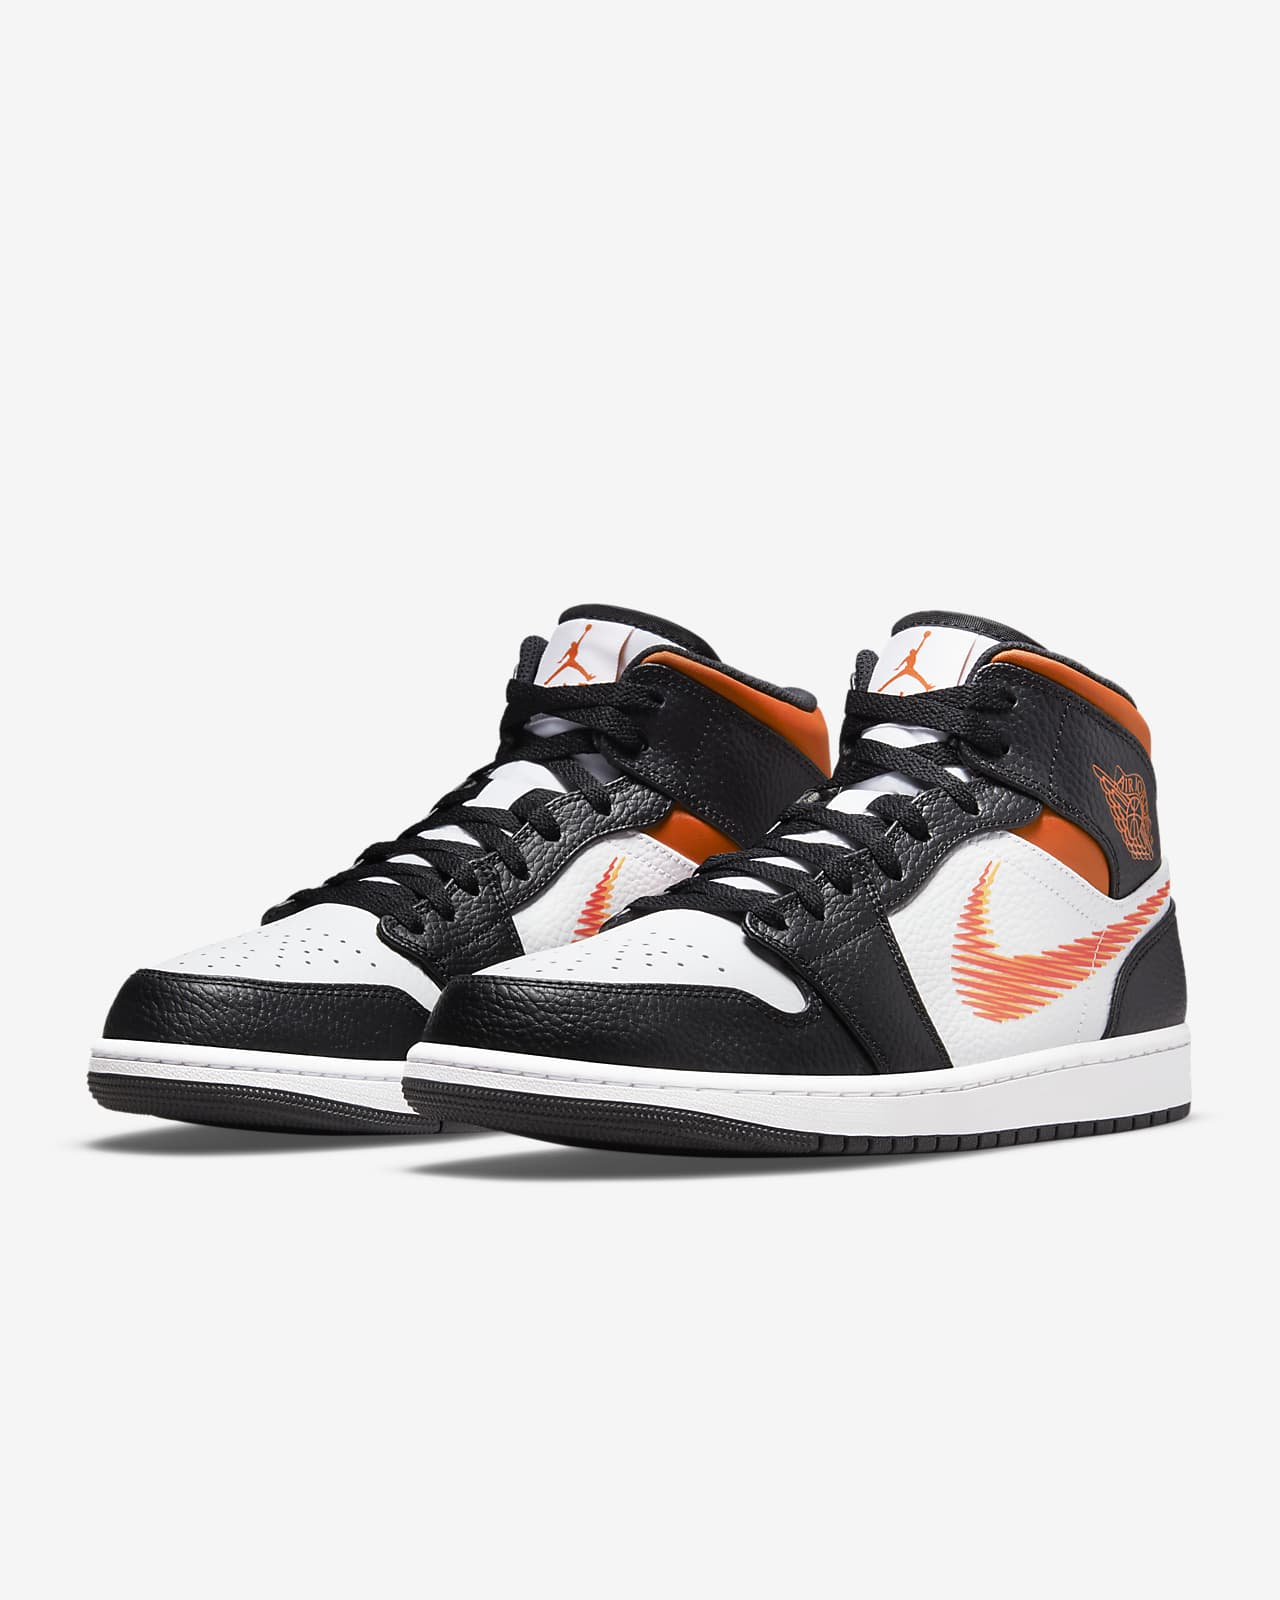 Air Jordan 1 Mid Men's Shoes